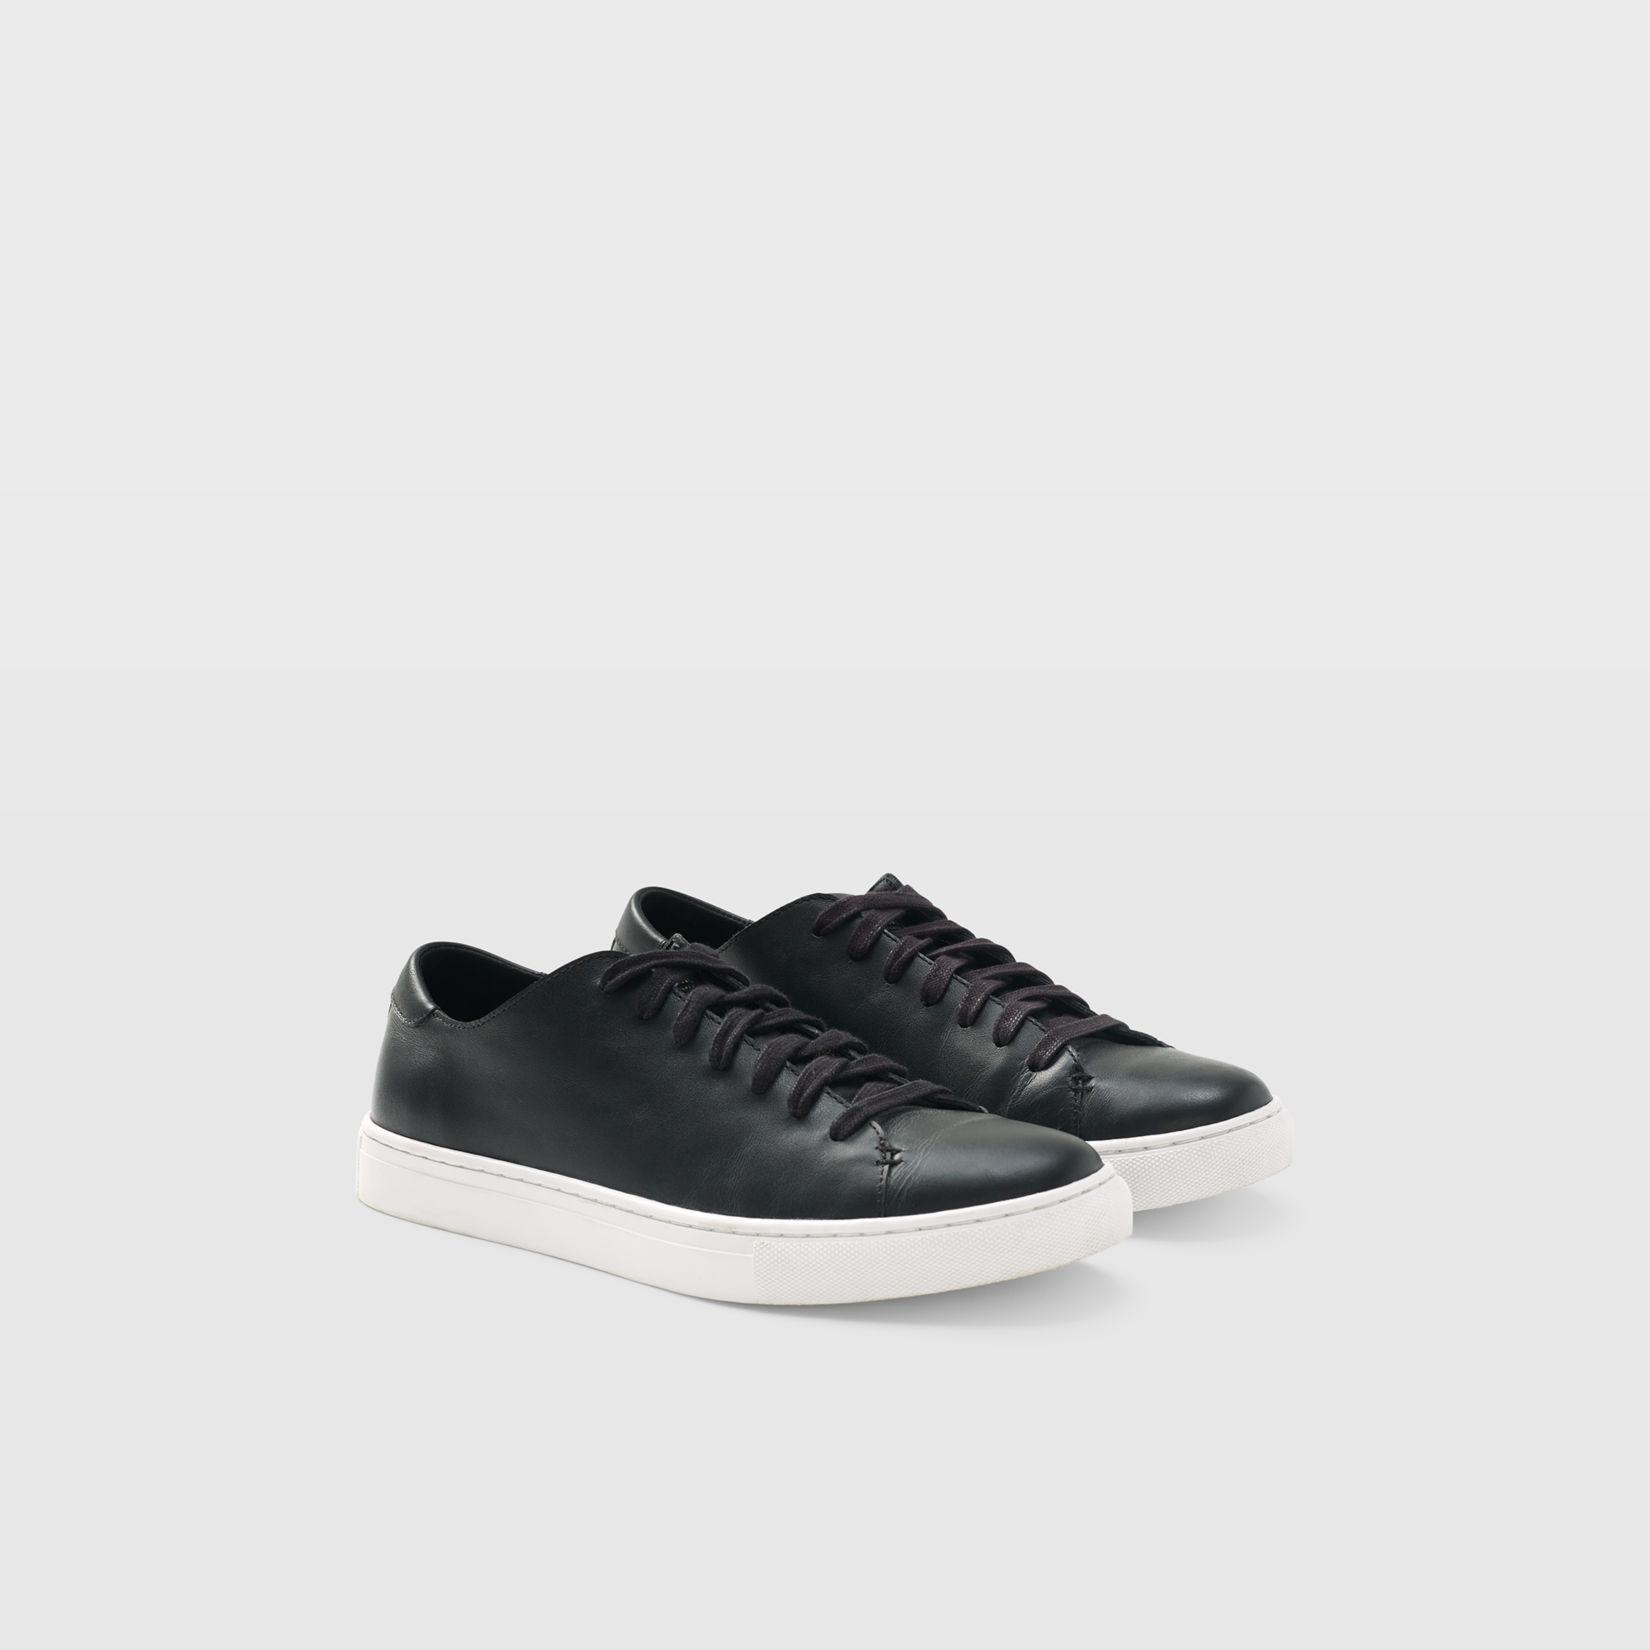 2125ad5379d1 Club Monaco Leather Sneaker ·  98.50 · Black